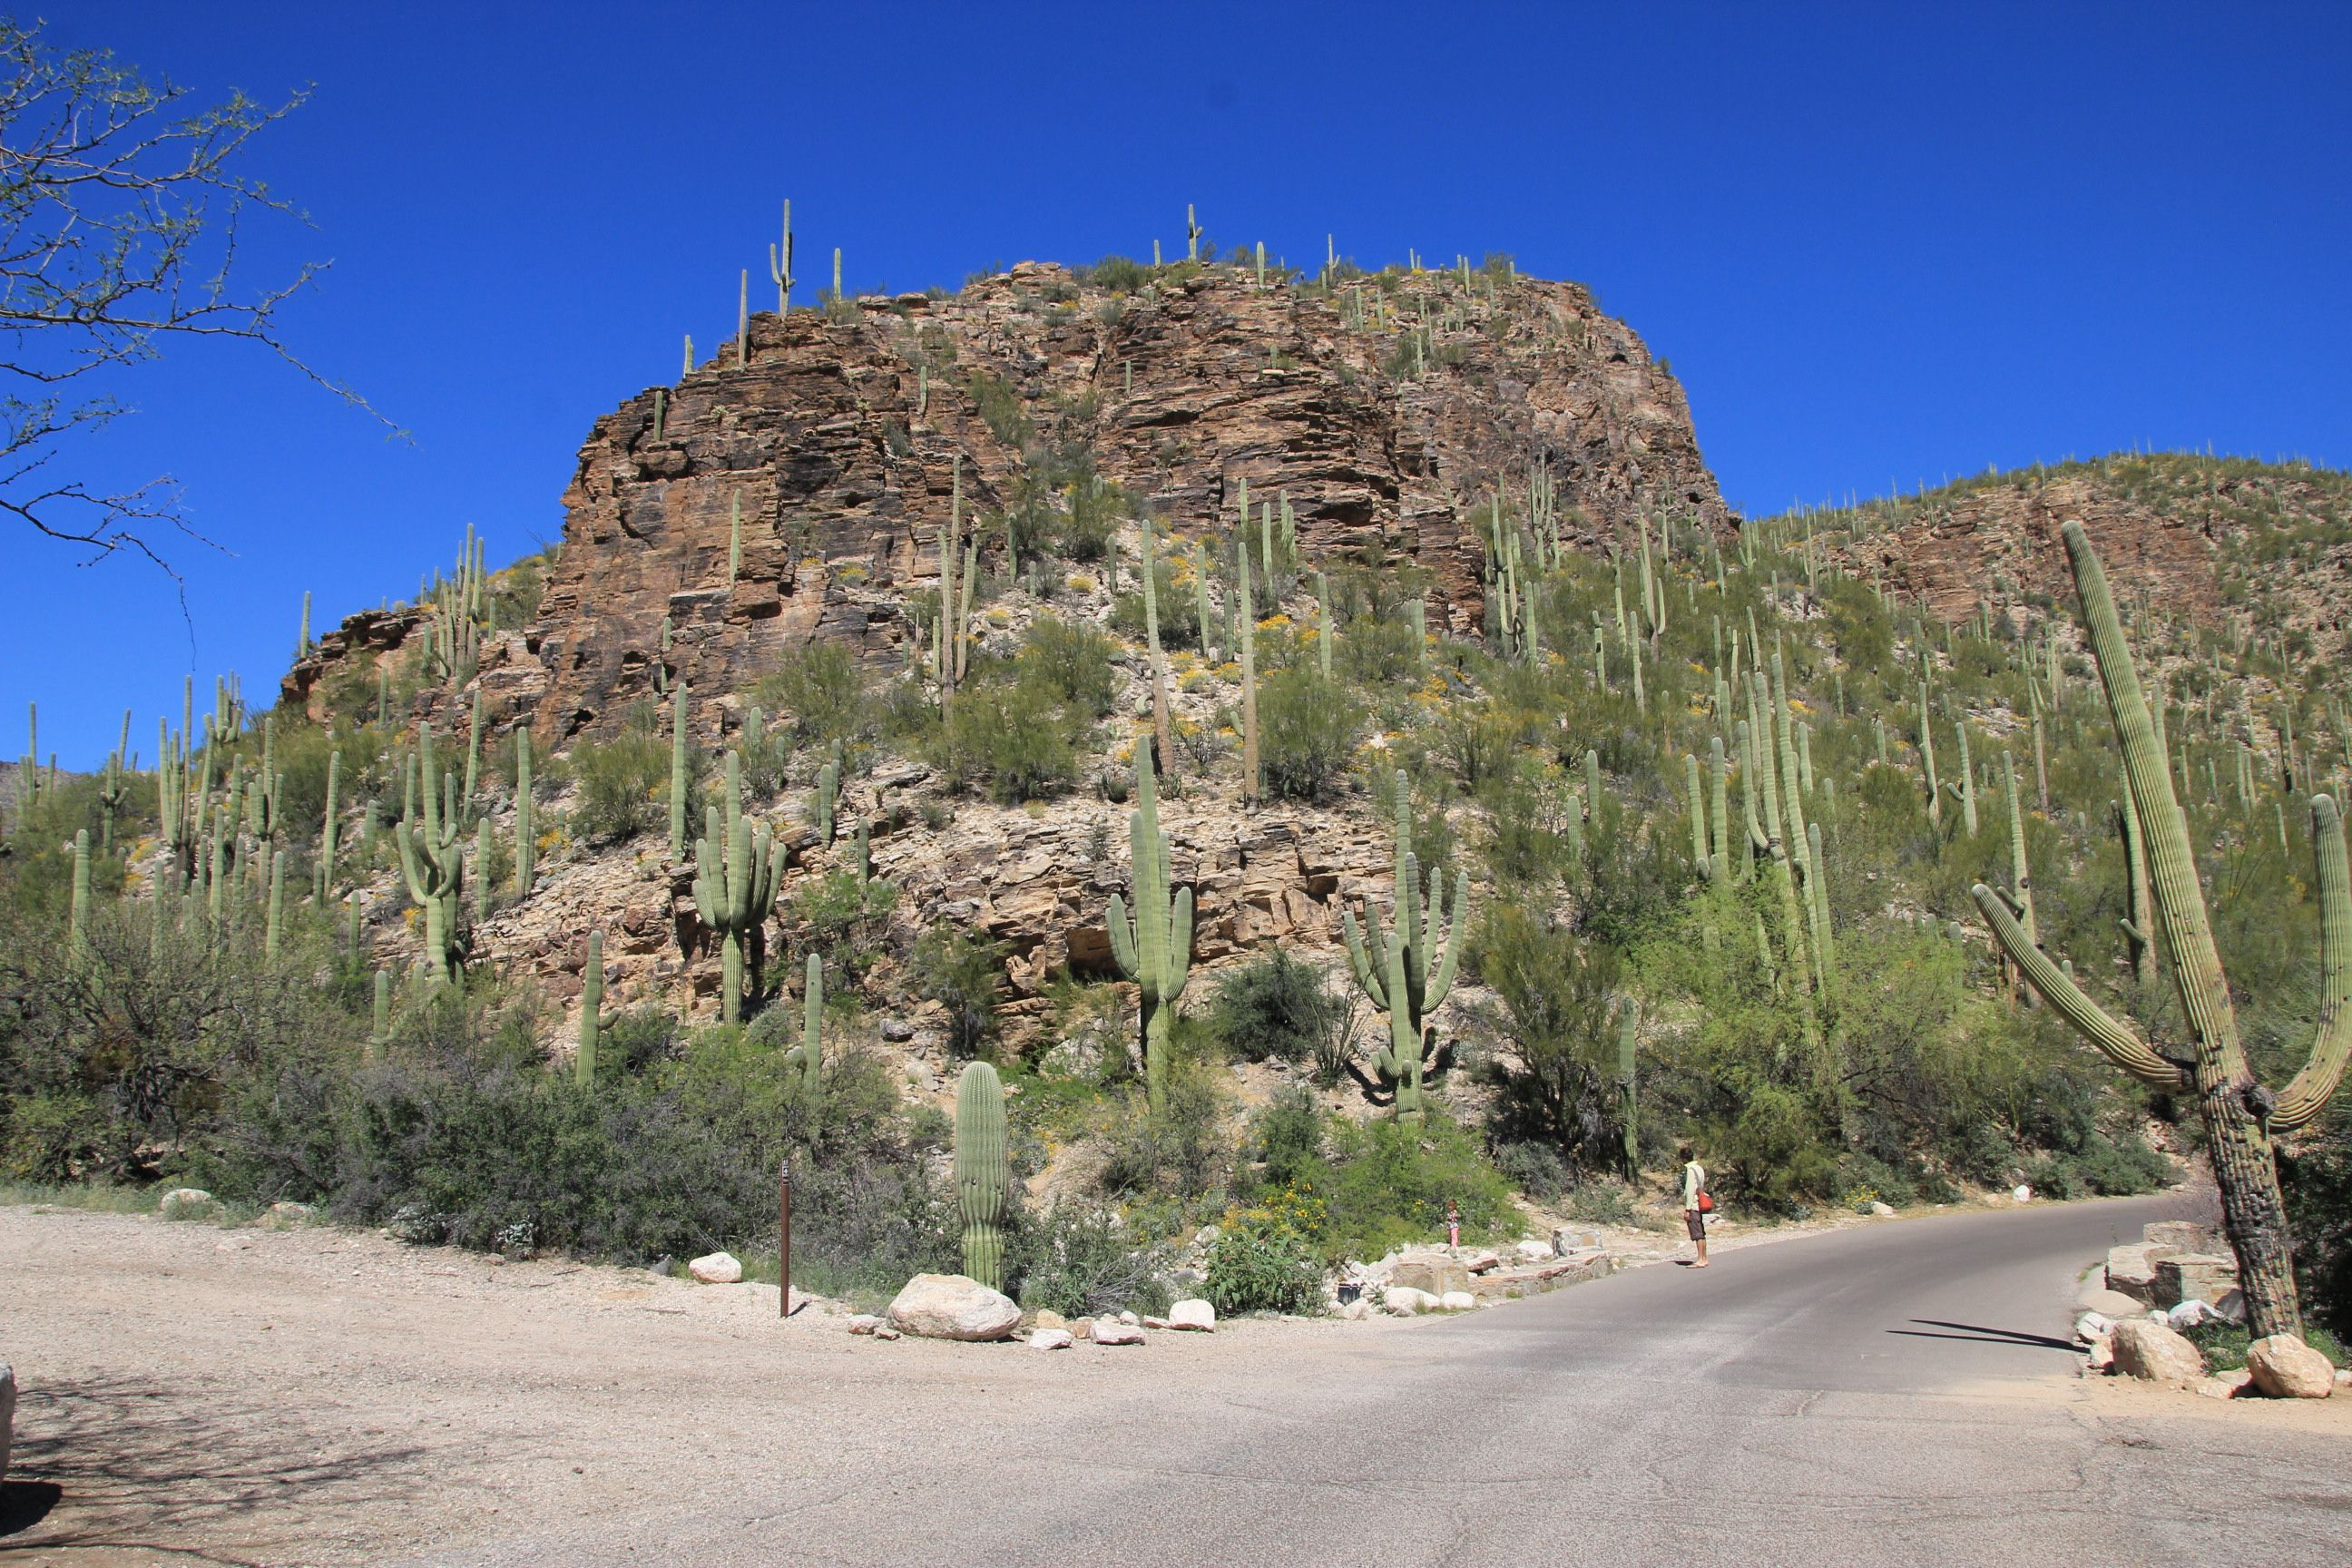 Sabino Canyon Recreation Area in Tucson, AZ